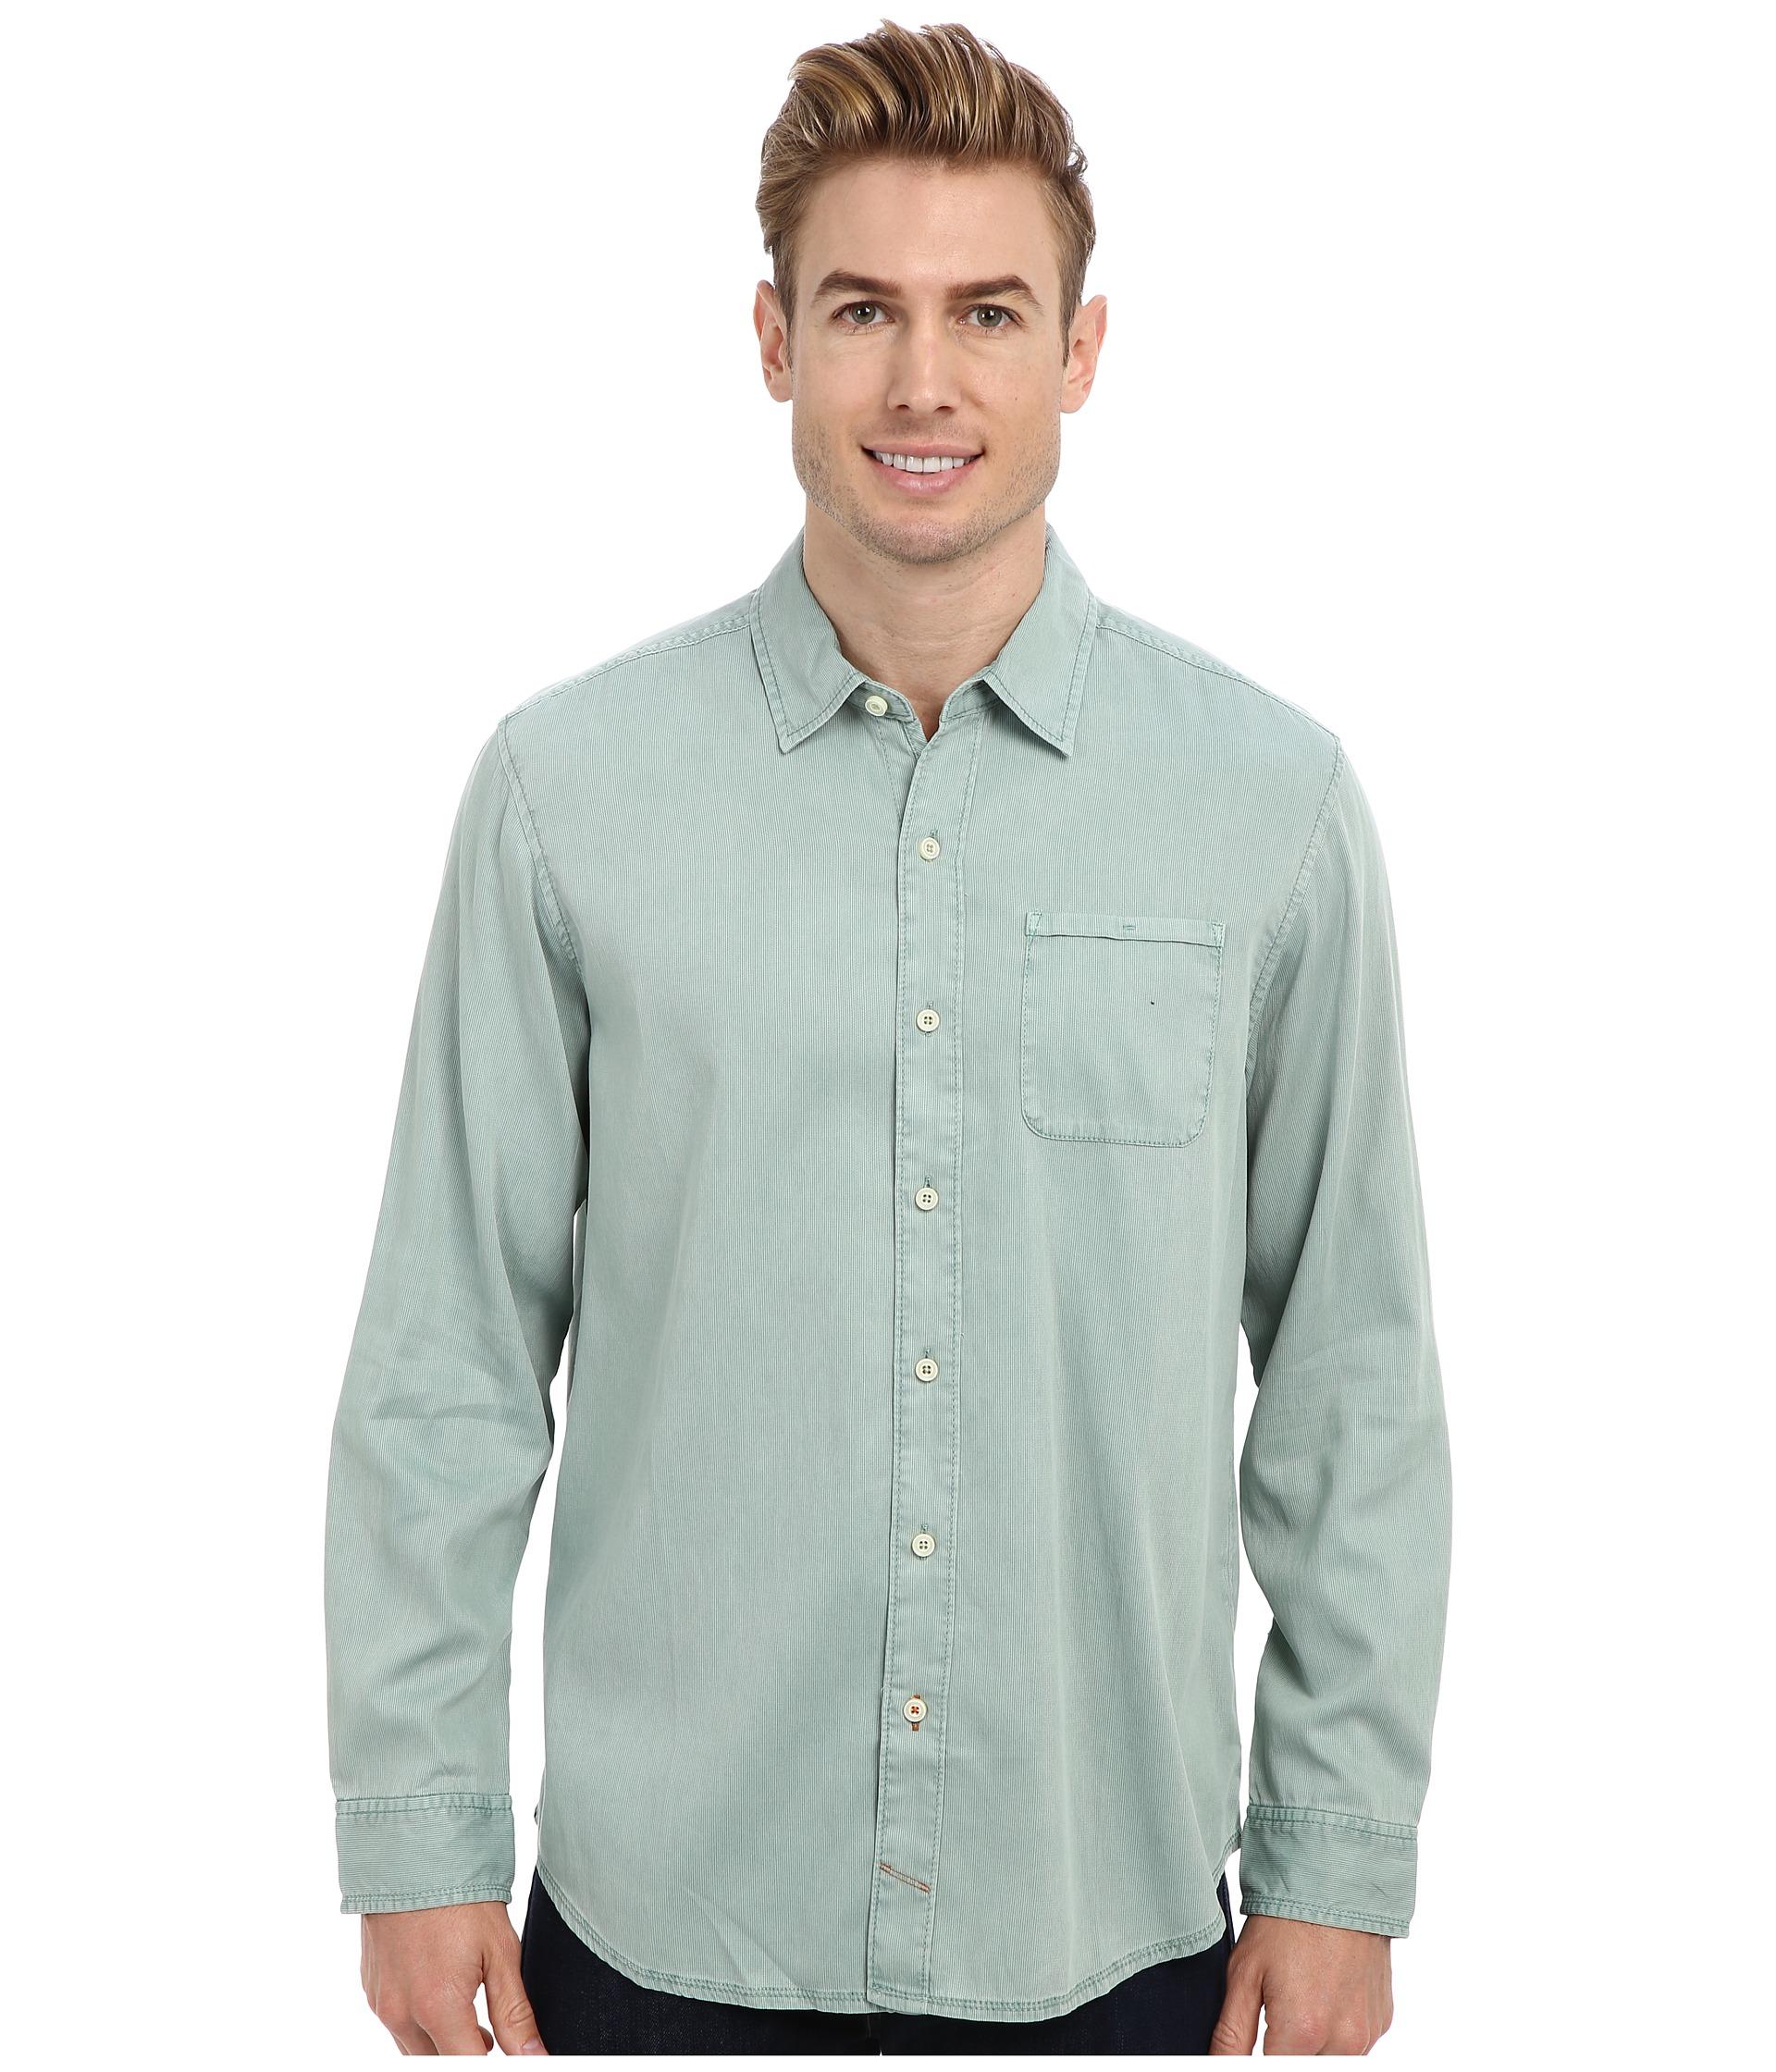 Tommy bahama island modern fit coastline cruiser ls shirt for Tommy bahama florida shirt